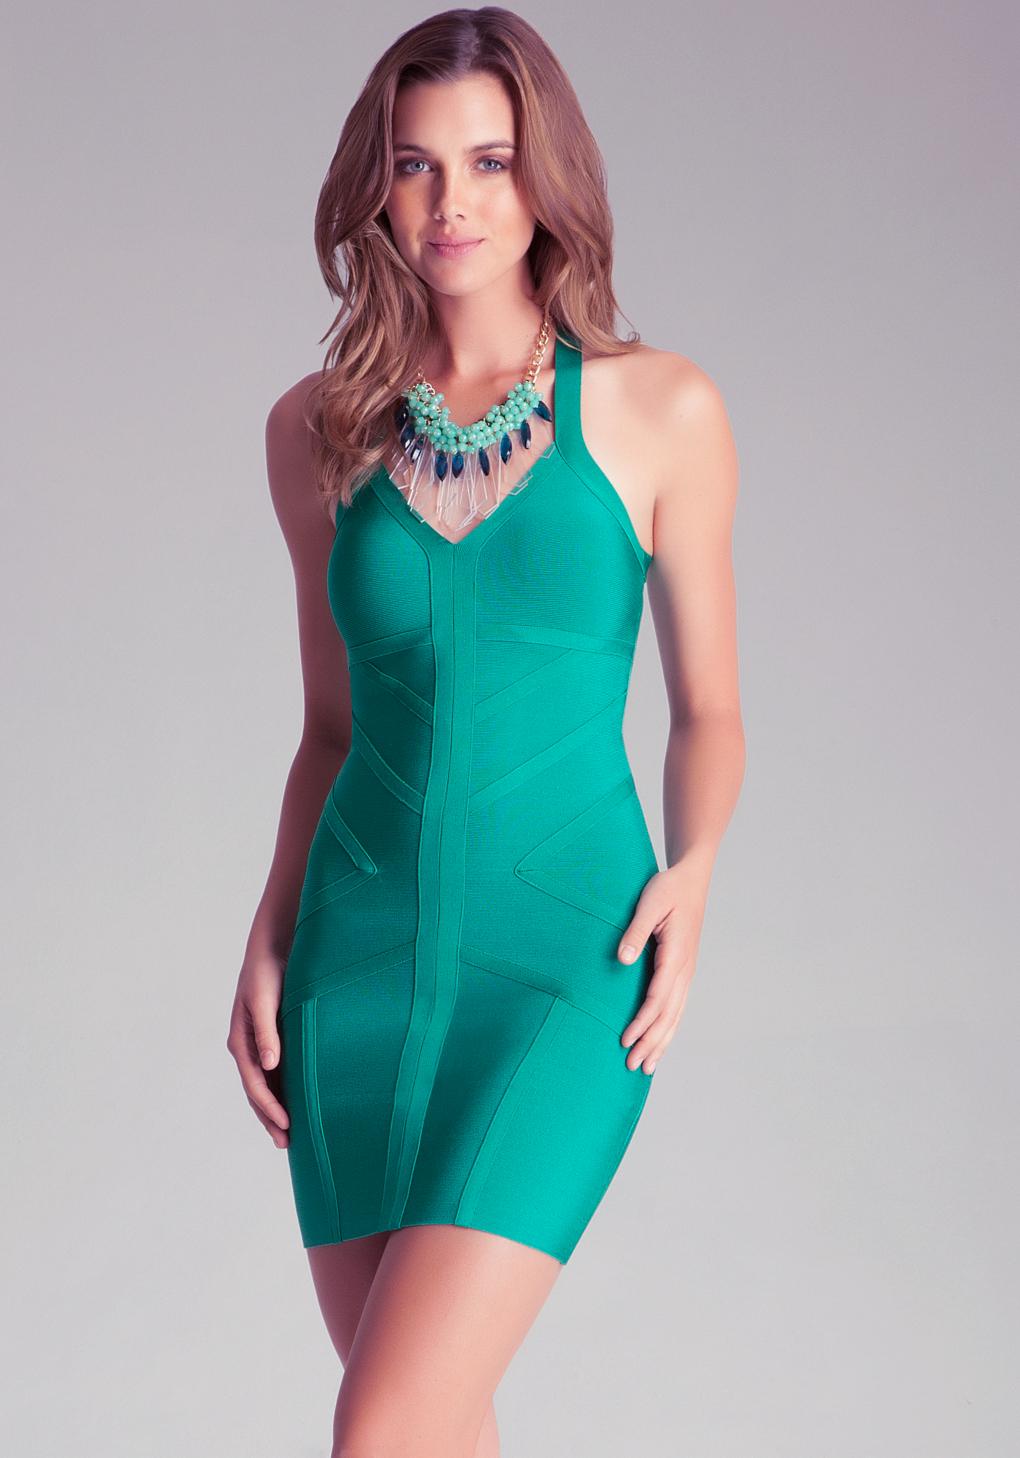 Lyst - Bebe Geo Trim Bodycon Dress in Green